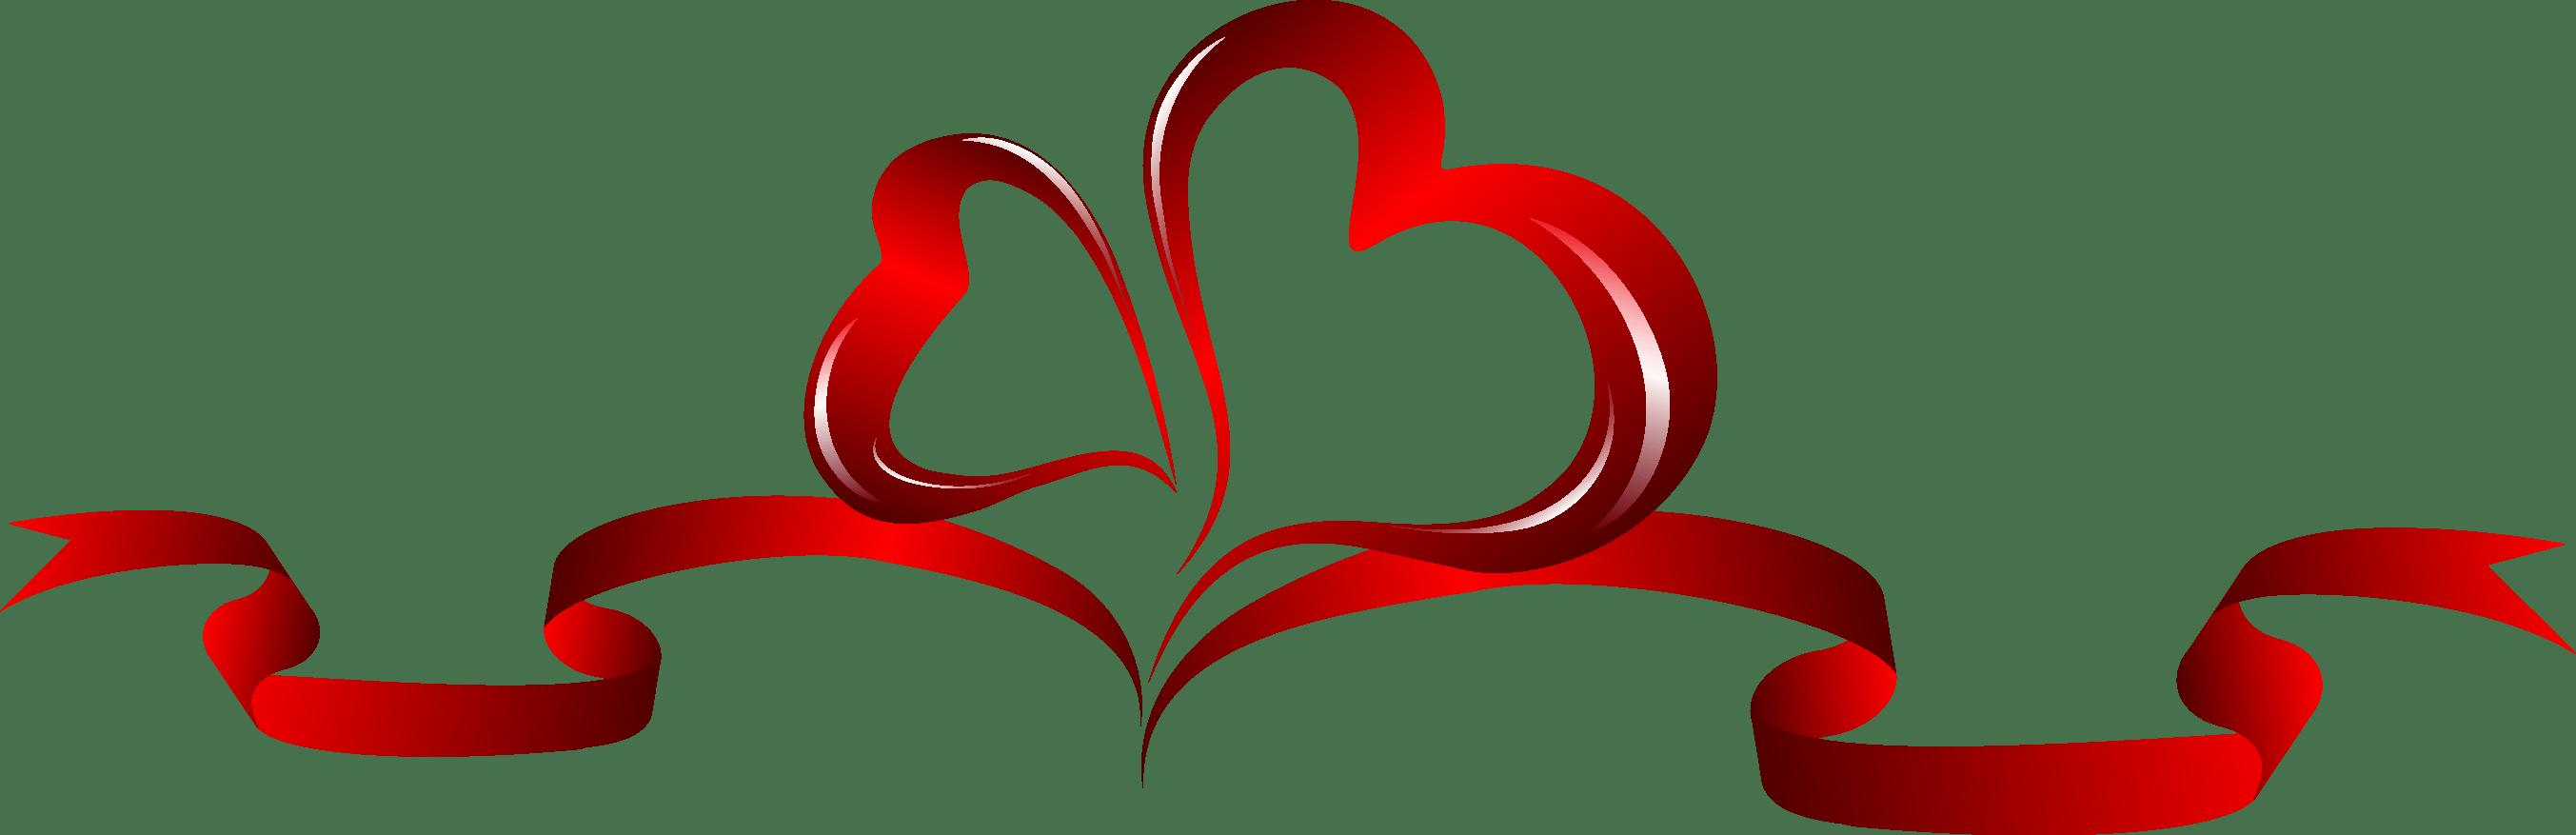 Ribbon Heart Free Vector Download Freelogovectors